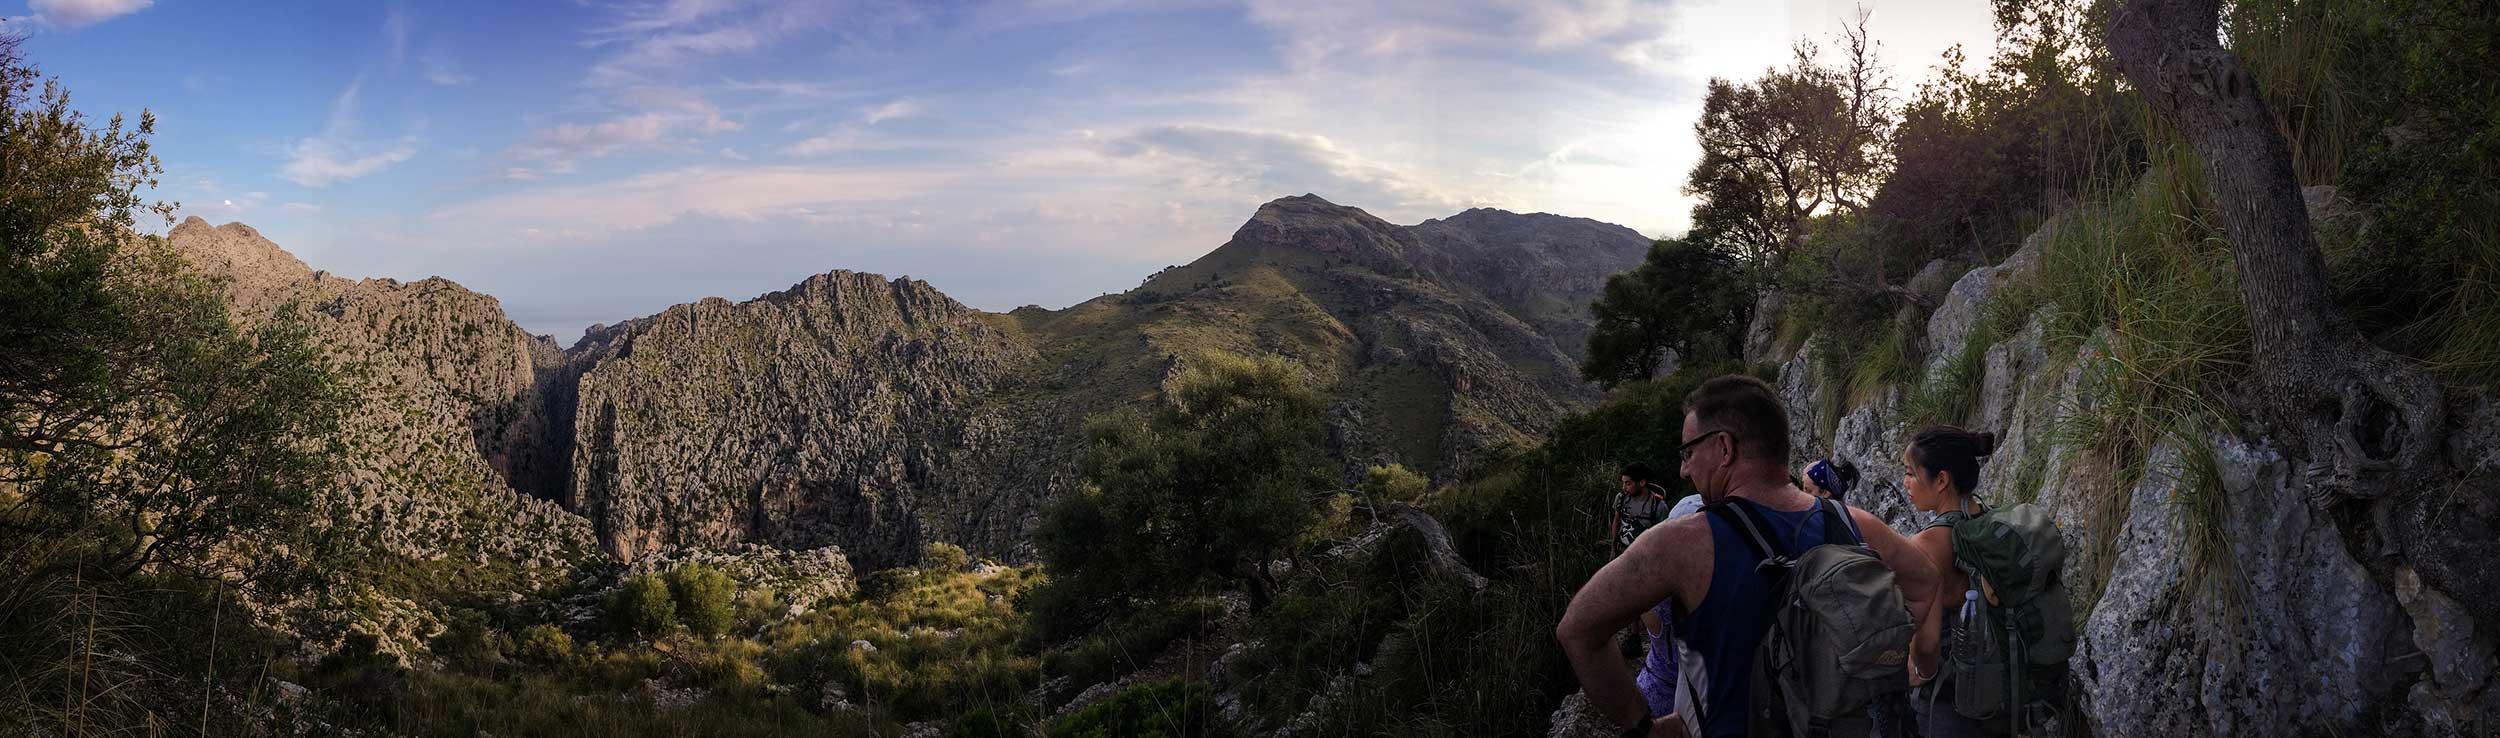 TDP-05-hiking-group-descending-toward-torrent-de-paries-hike-mallorca.jpg